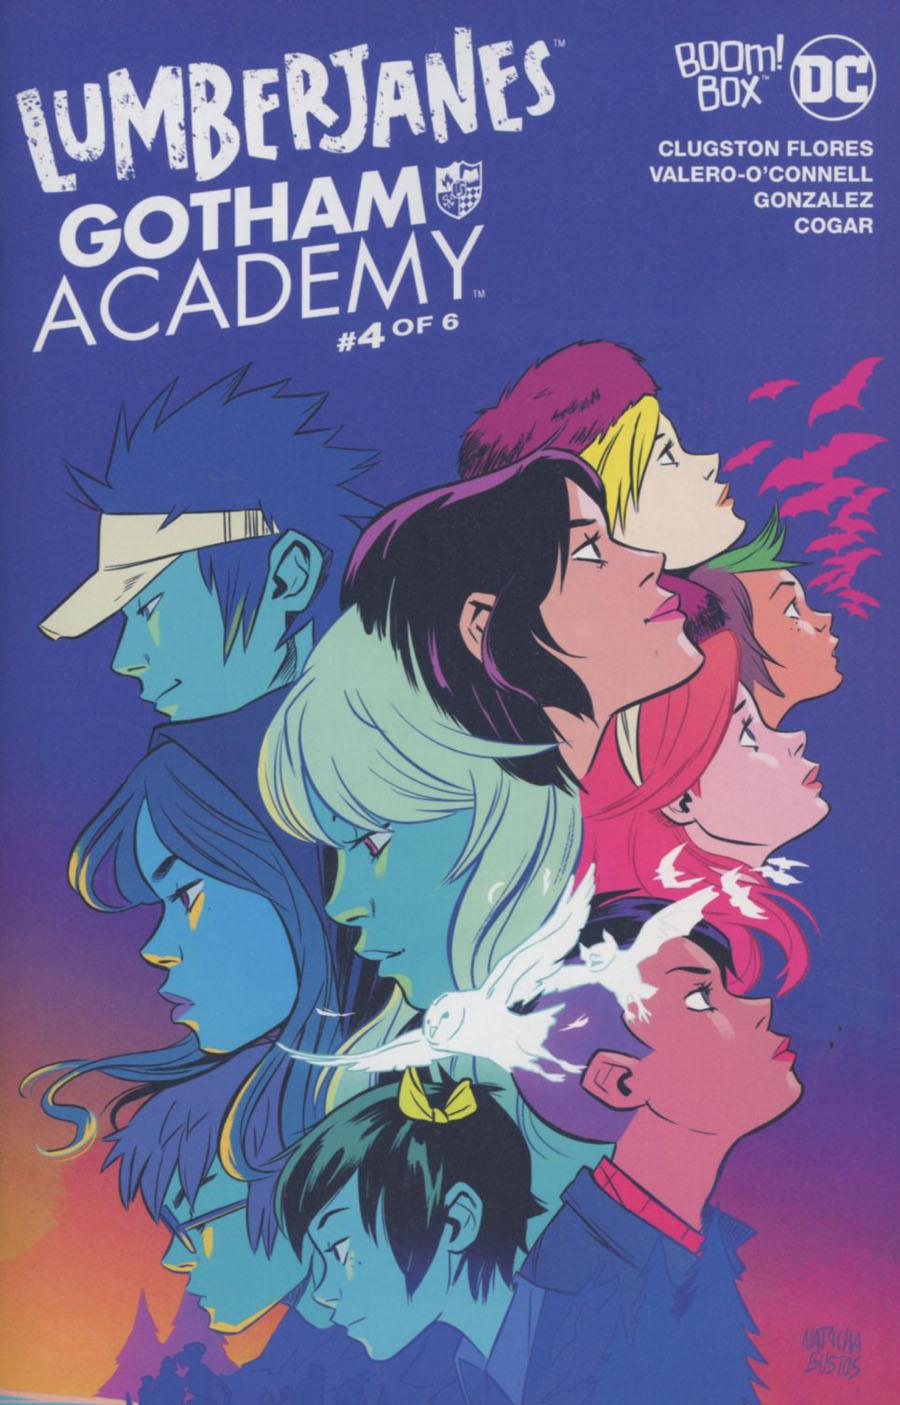 Lumberjanes Gotham Academy #4 Cover A Regular Natacha Bustos Cover